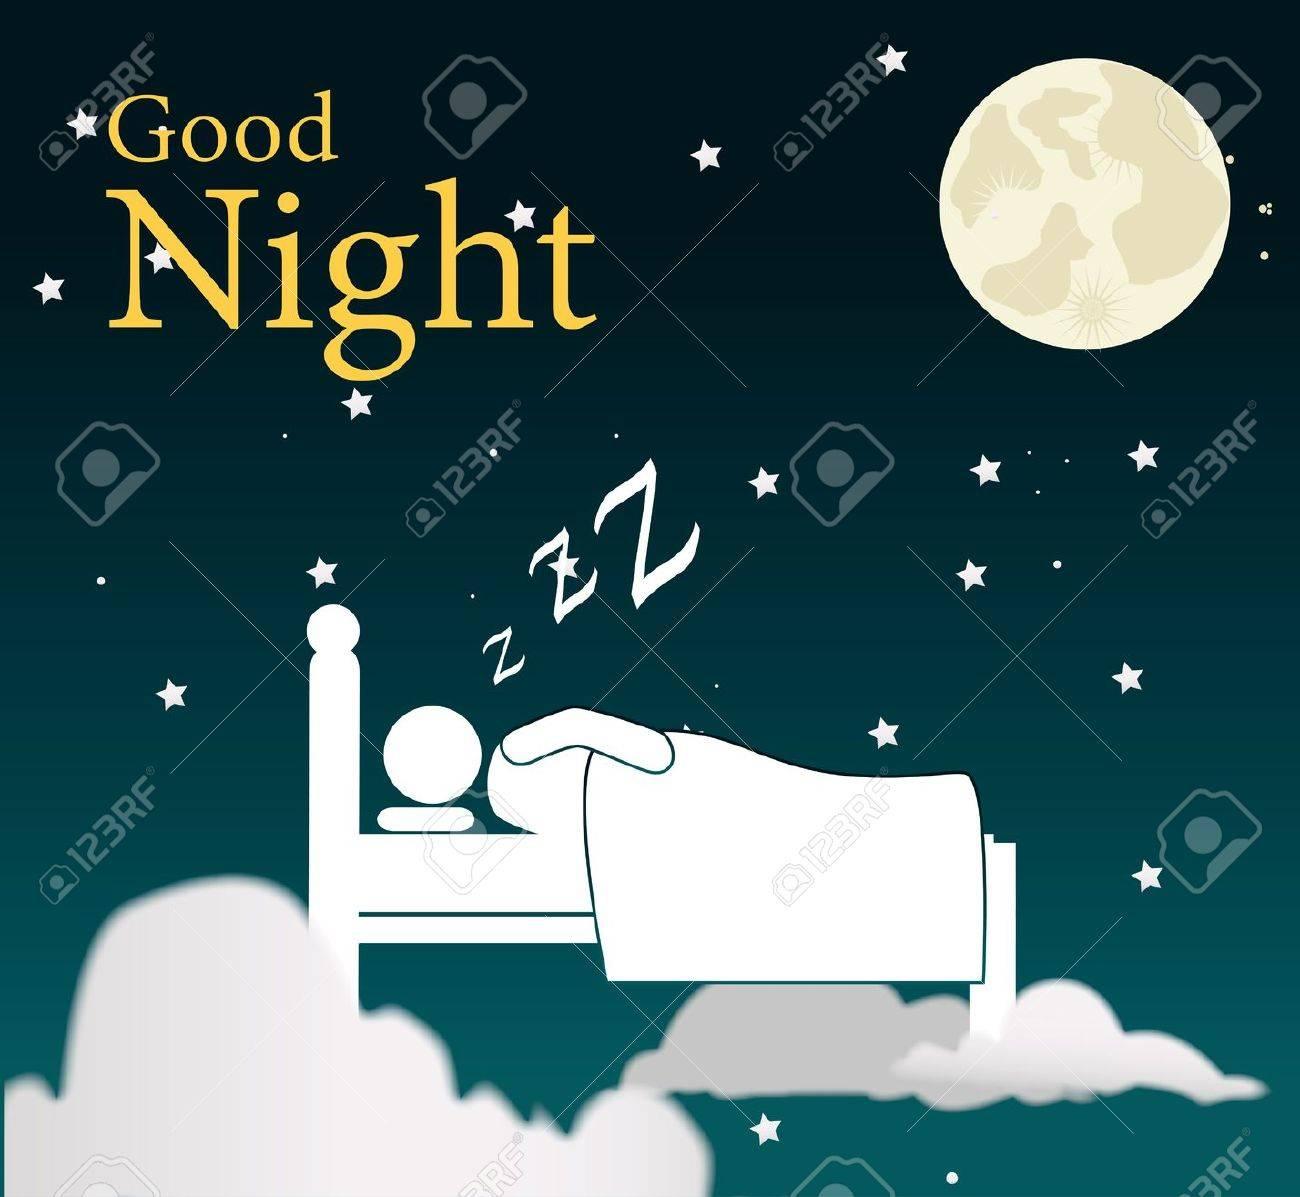 good night design over sky background vector illustration Stock Vector - 21372140